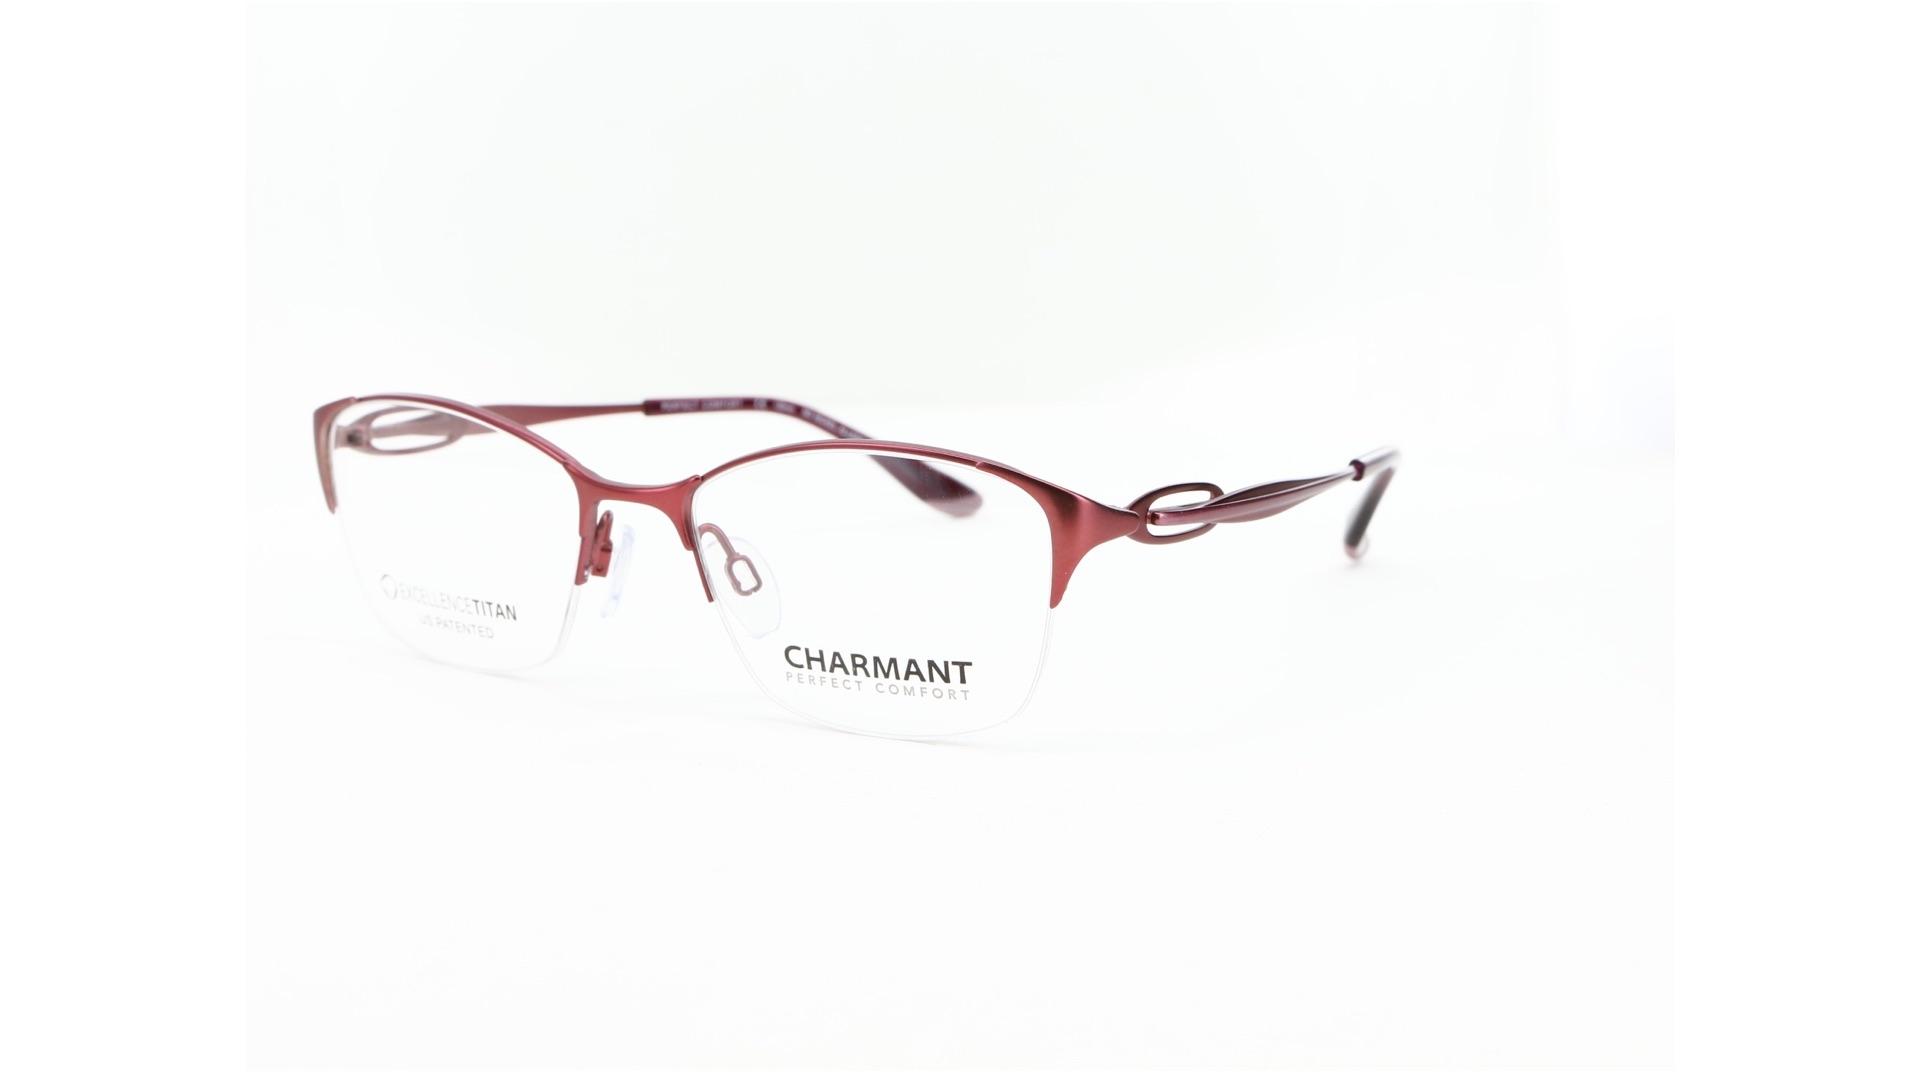 Charmant - ref: 81892